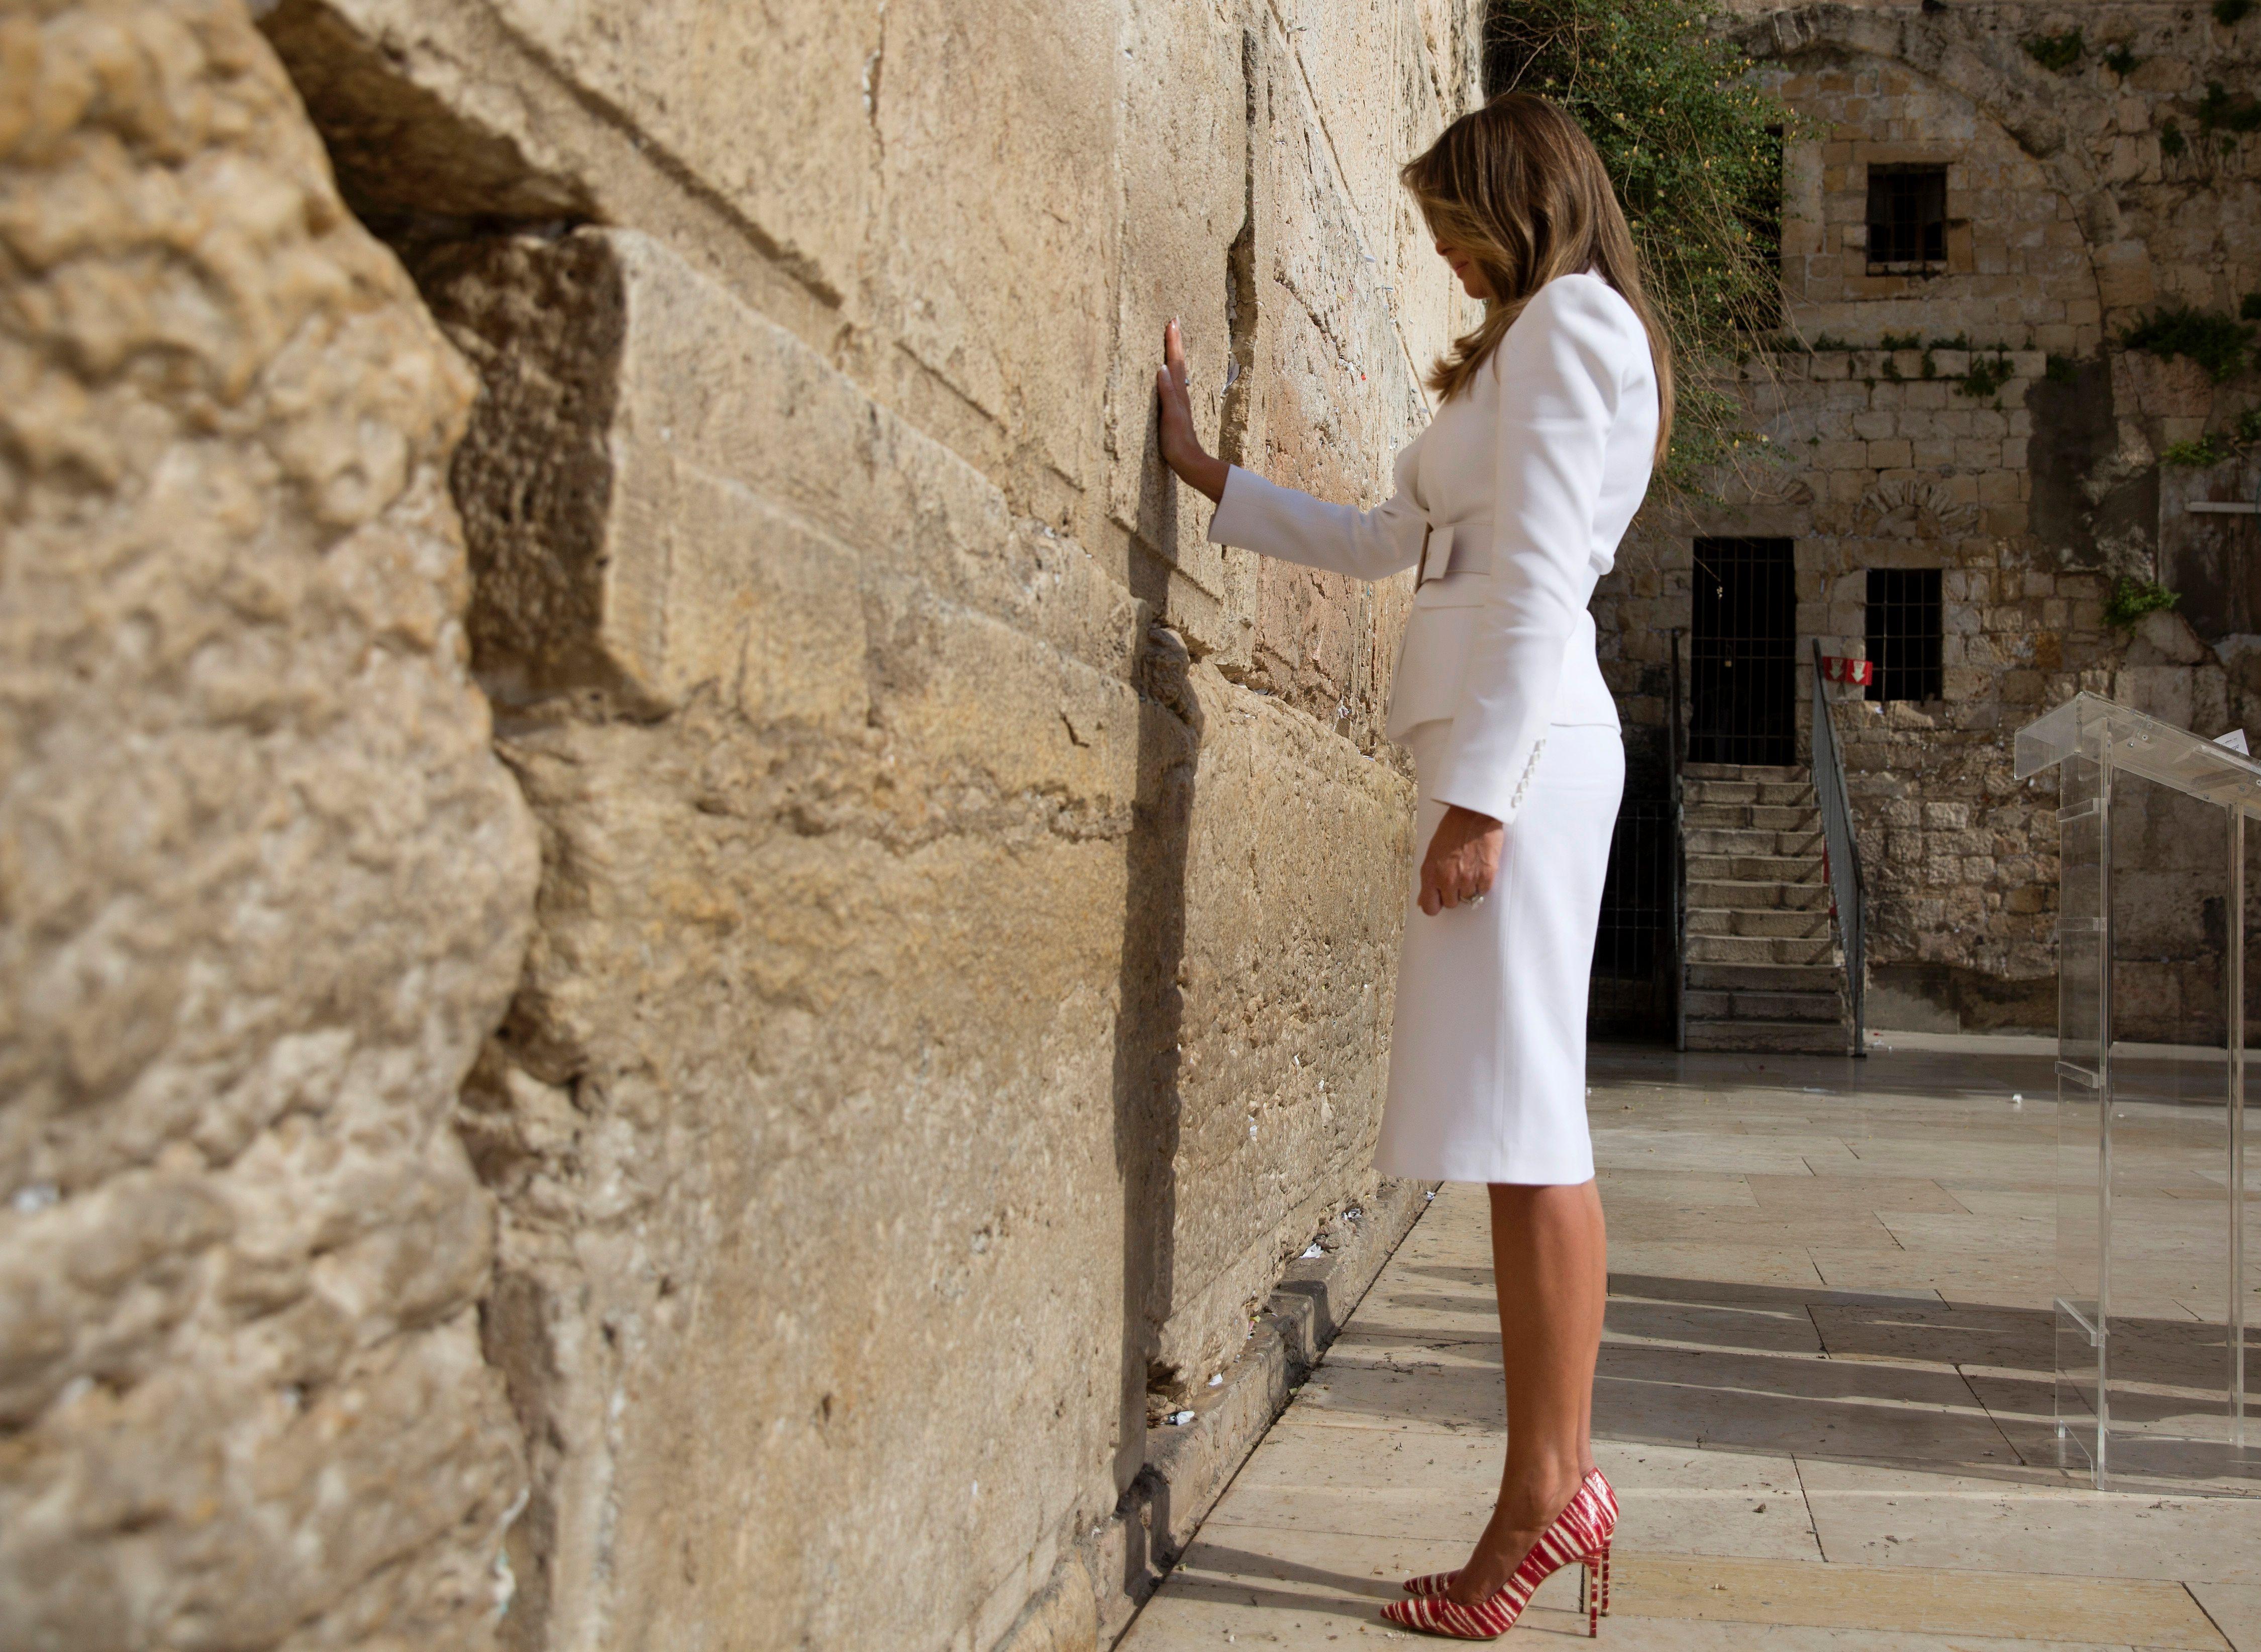 TOPSHOT-ISRAEL-US-DIPLOMACY